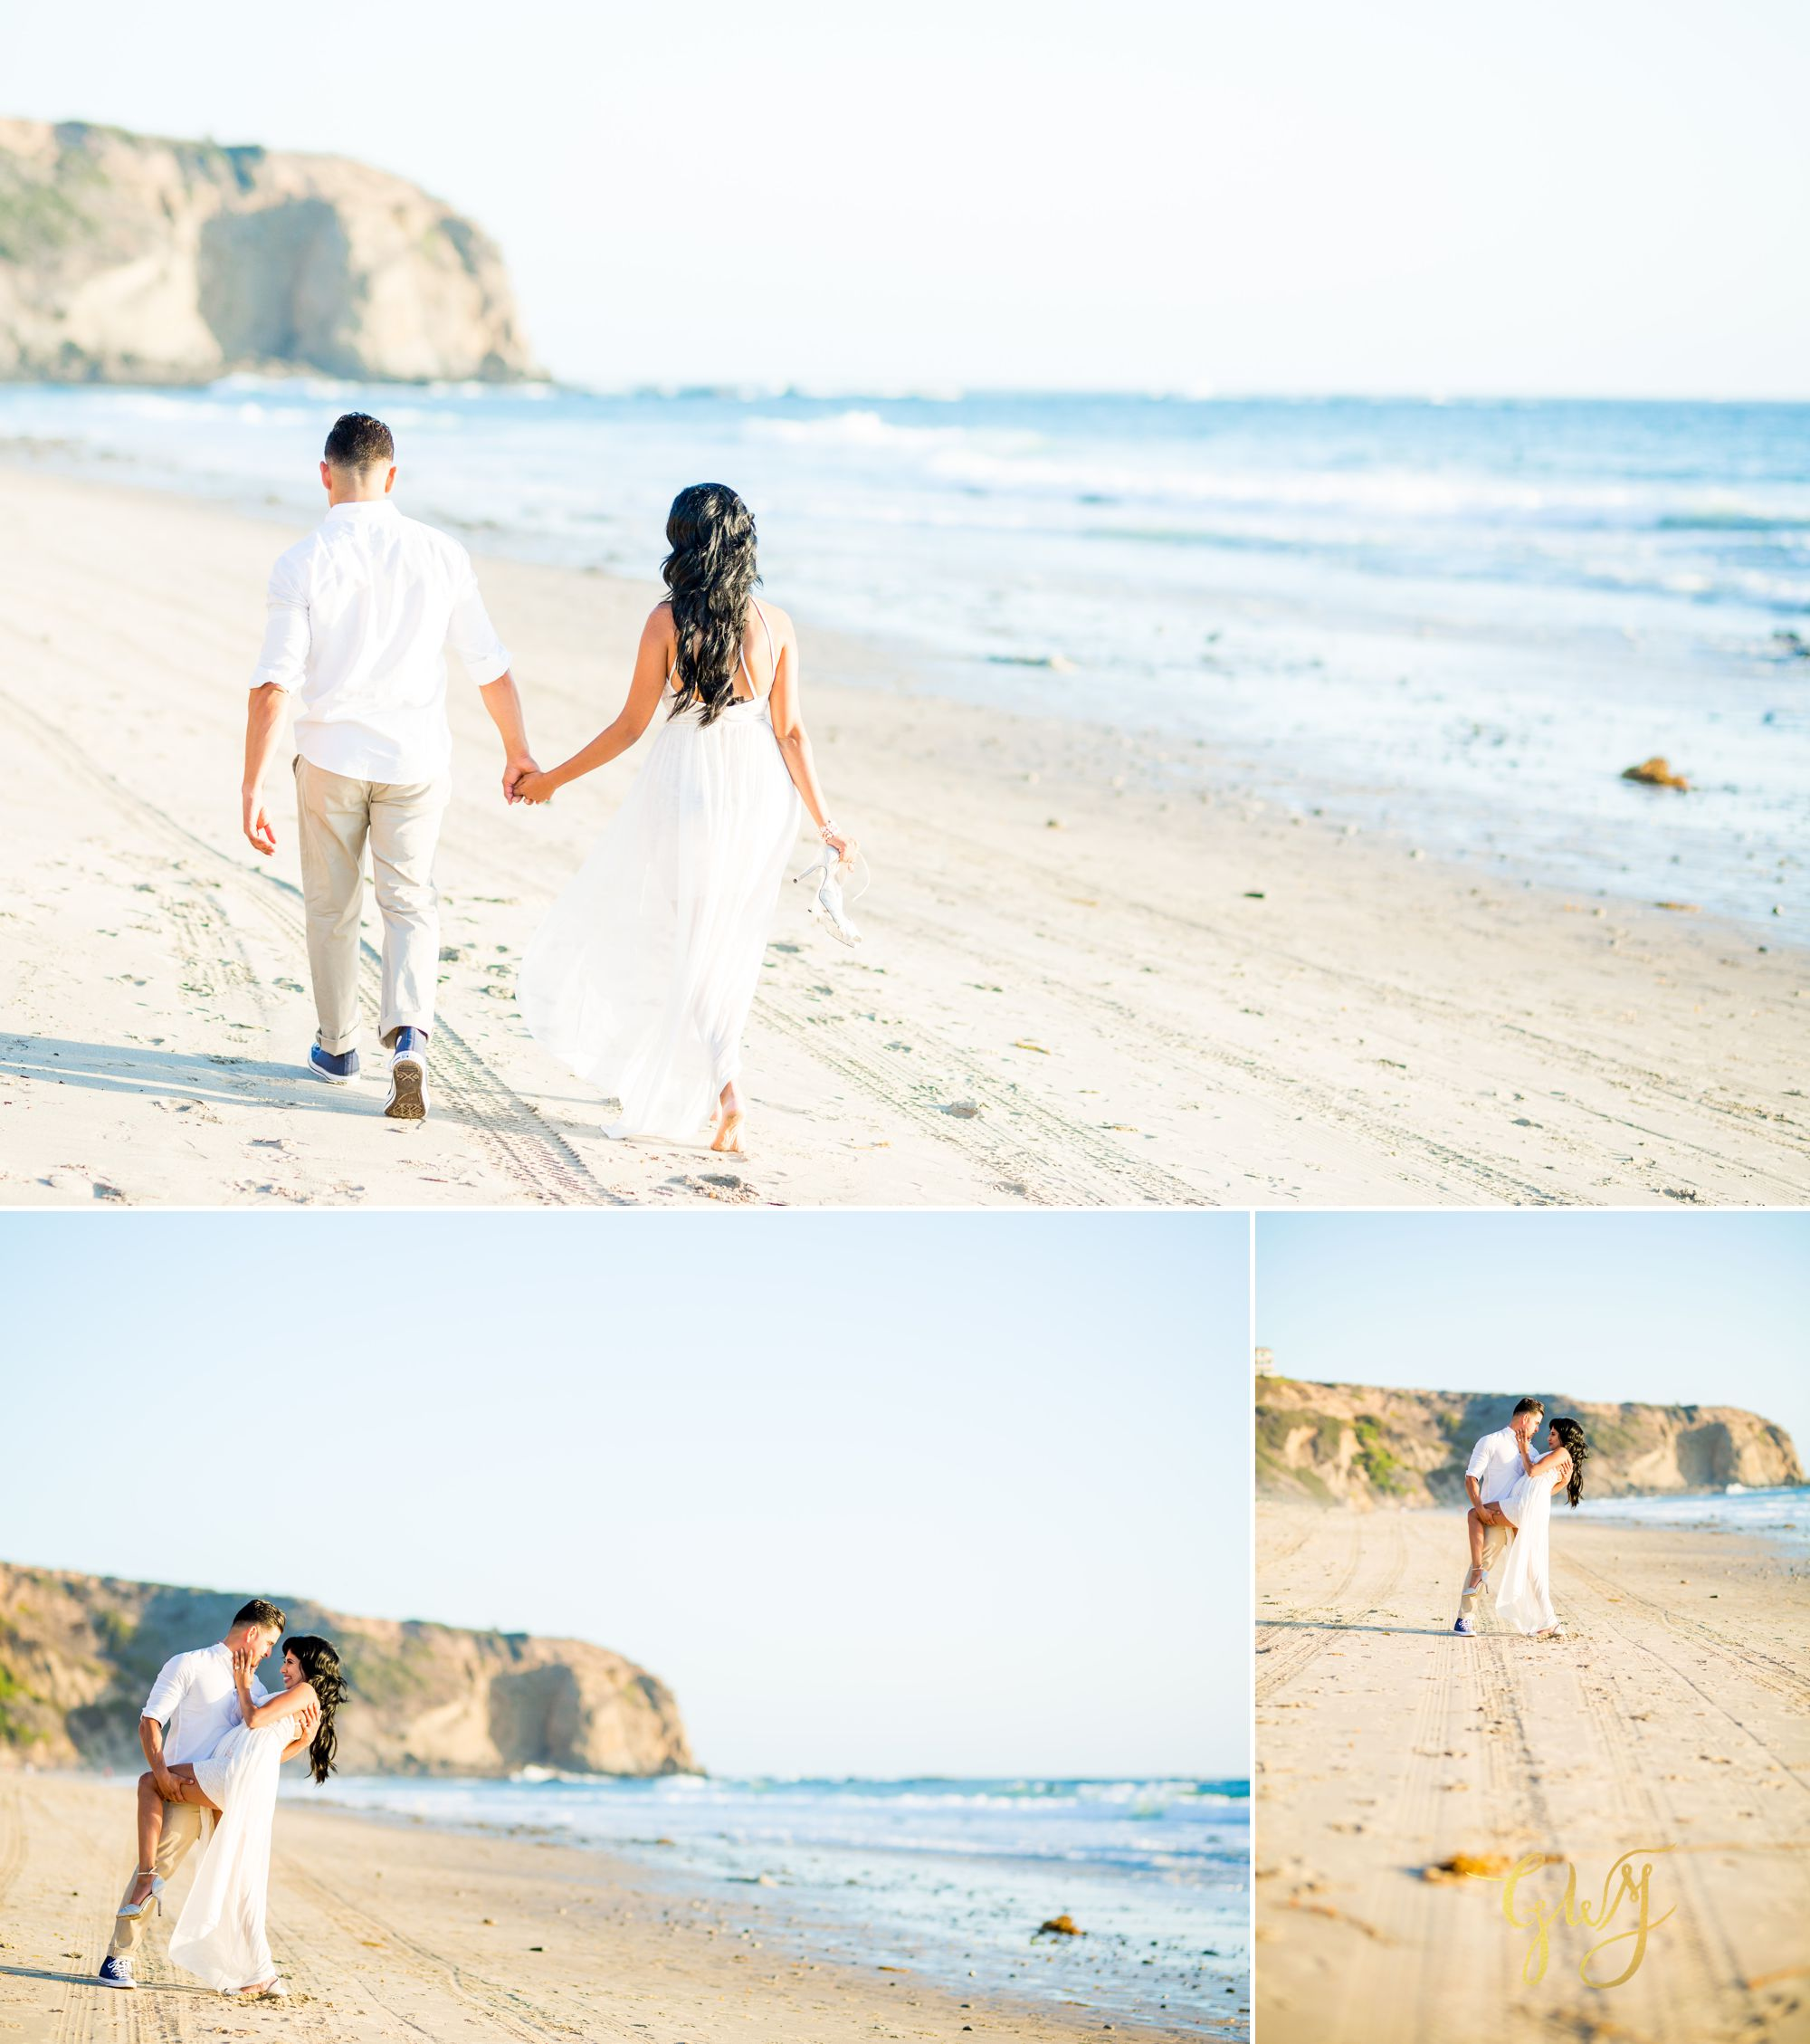 Angela + Drew Mission San Juan Capistrano Strands Beach Sunset Engagement 8.jpg